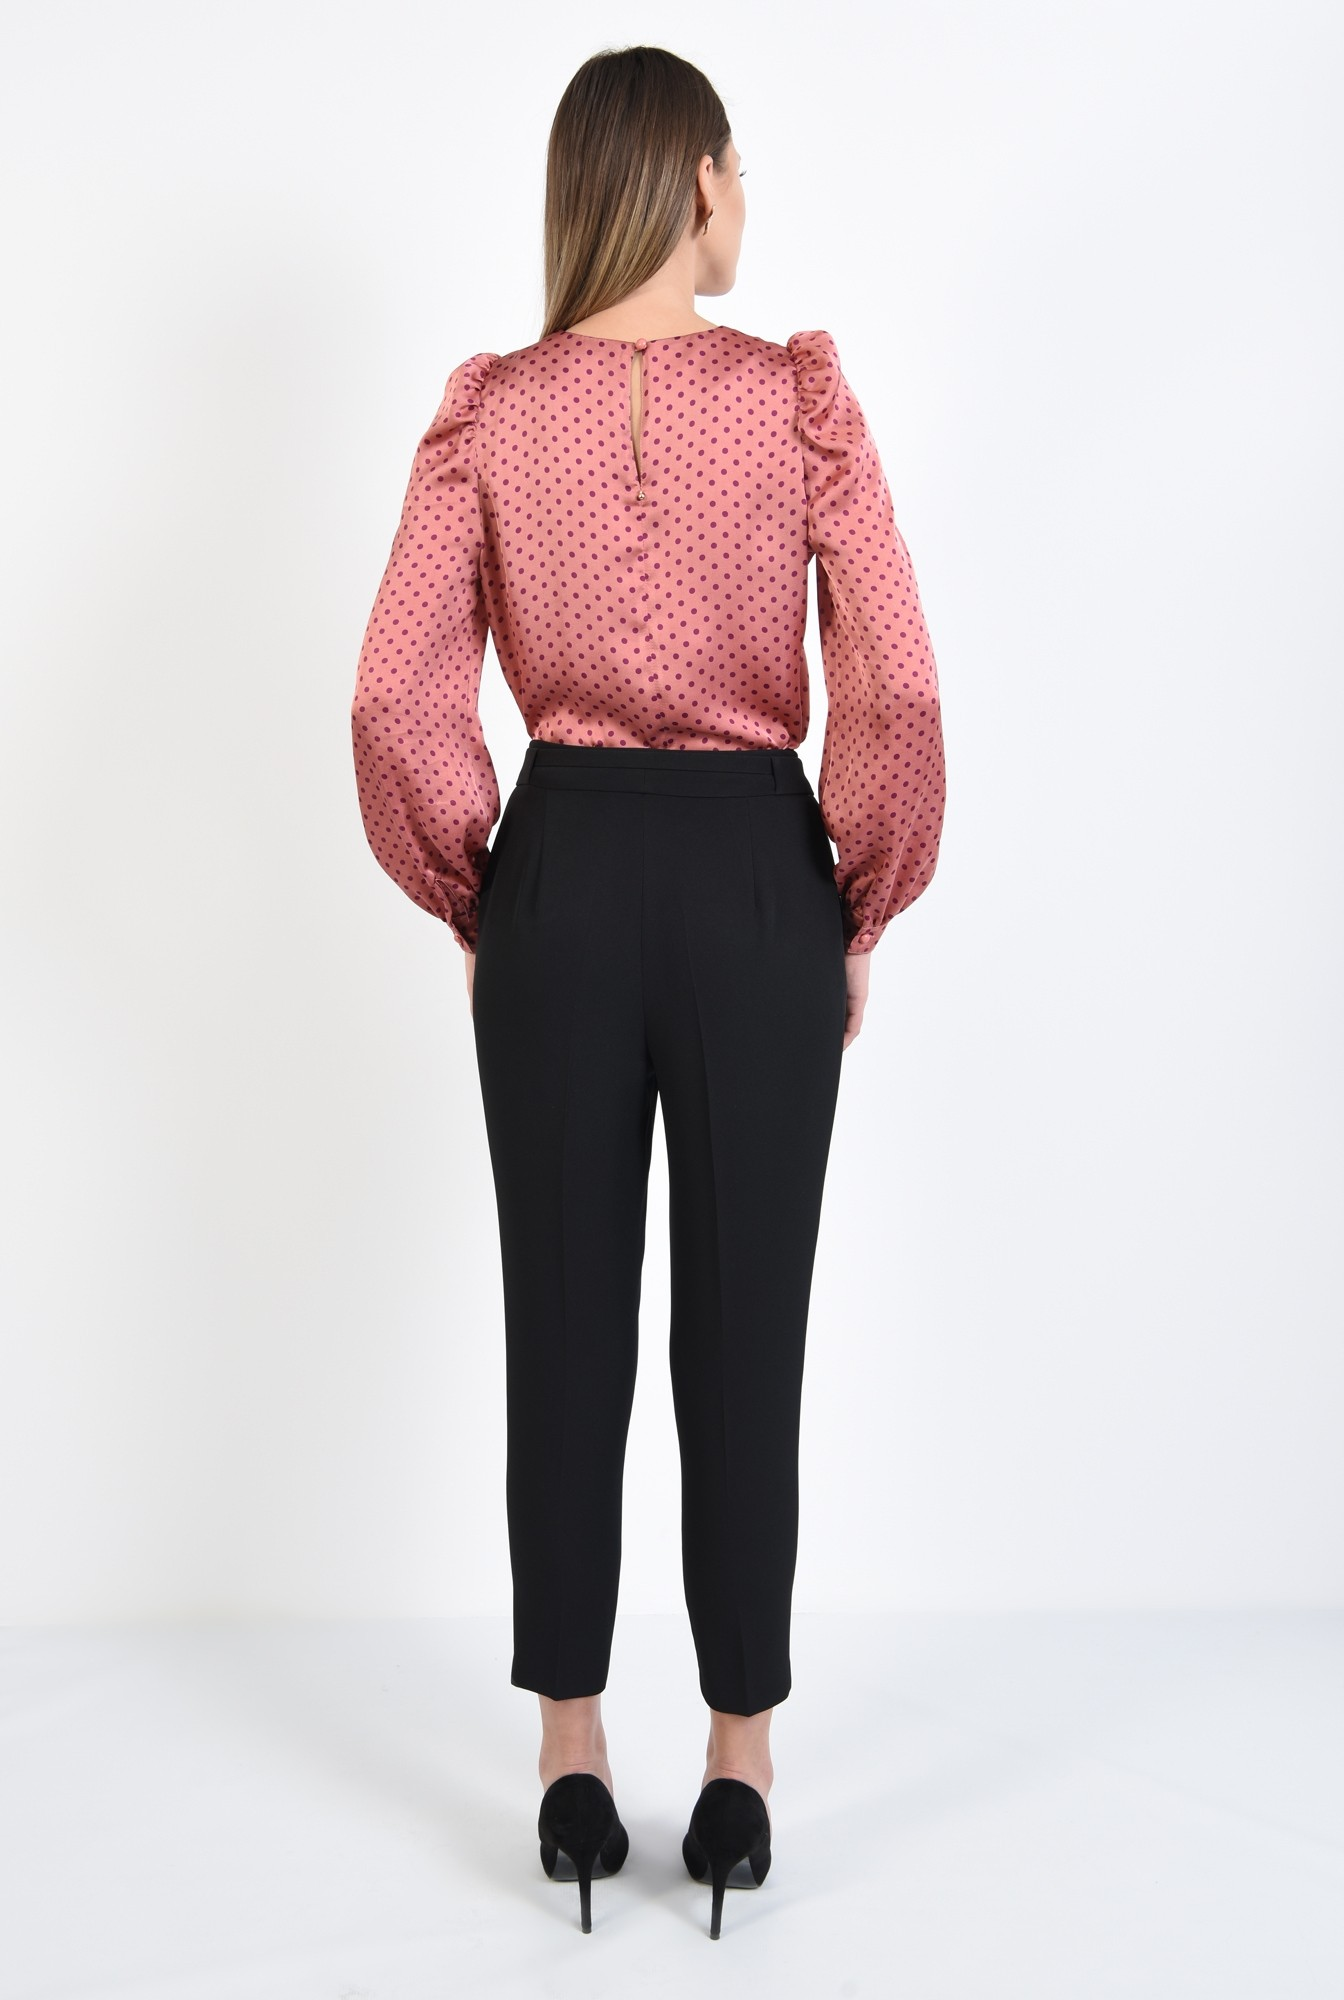 1 - 360 - bluza cu picouri, din satin roz, maneci lungi, croi drept, buline